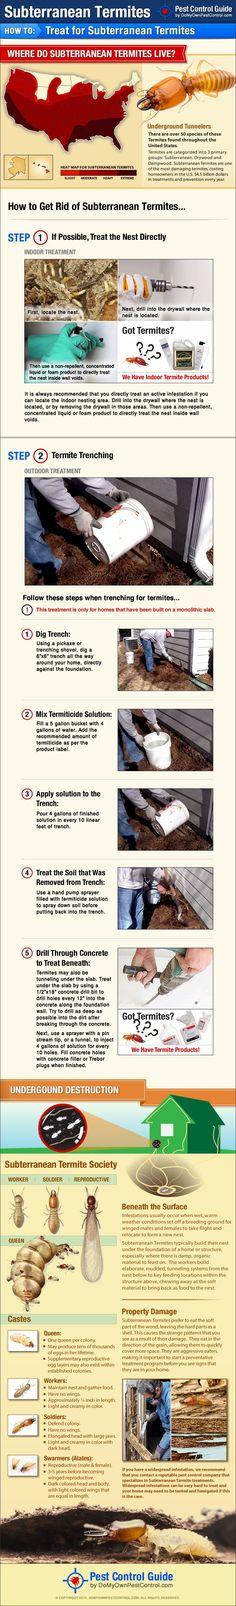 Subterranean Termite Treatment - How to Get Rid of Subterranean Termites